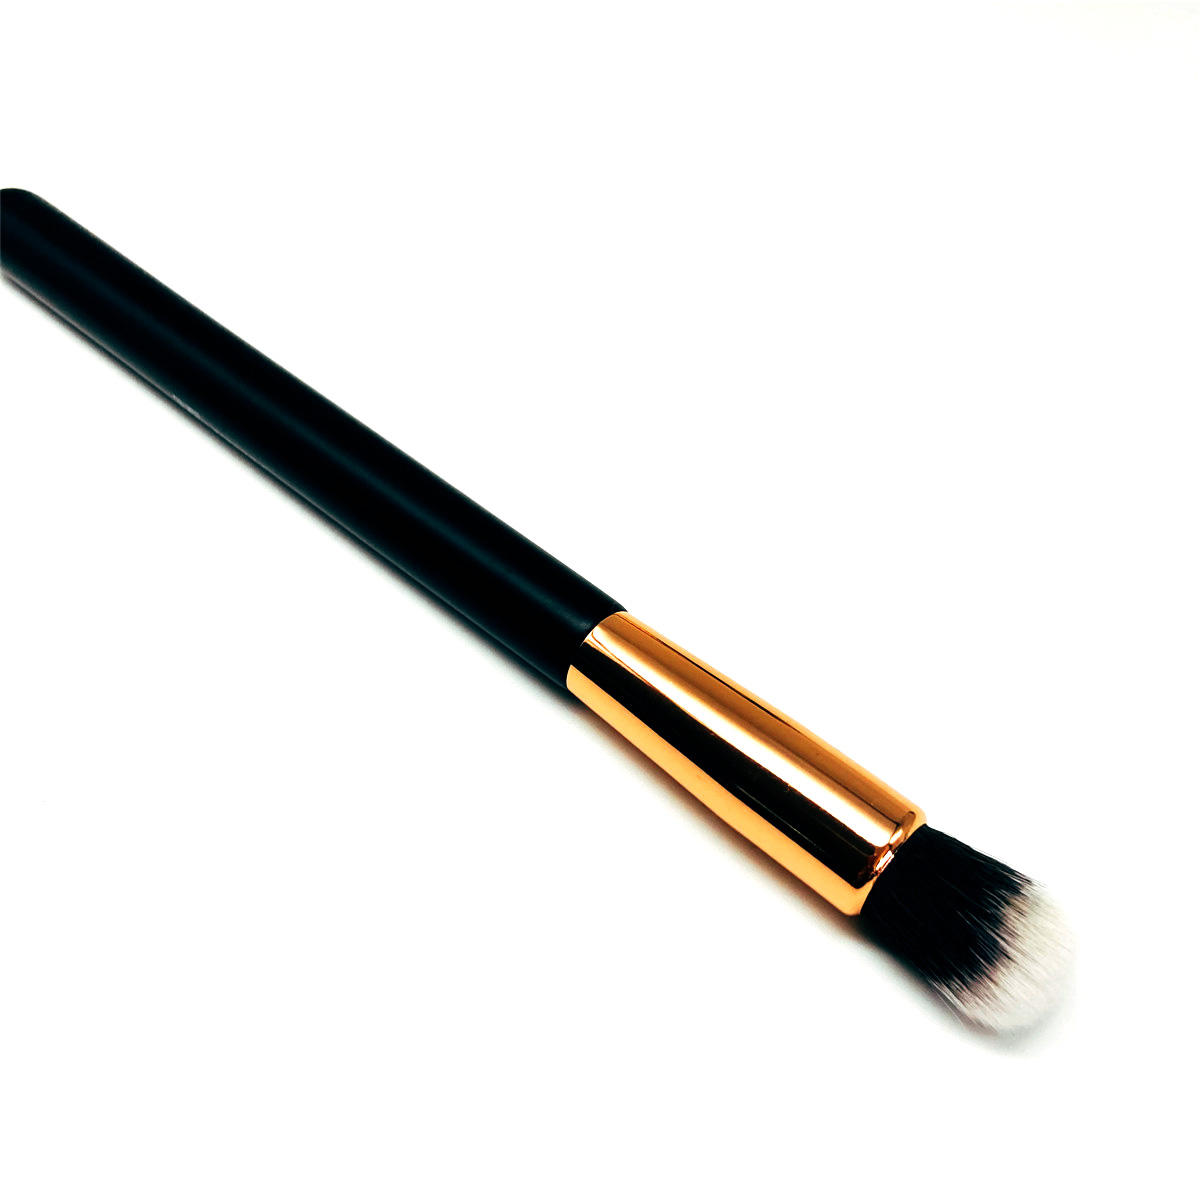 Makeup concealer brush professional synthetic hair vegan brushes cruelty free make up concealer brush